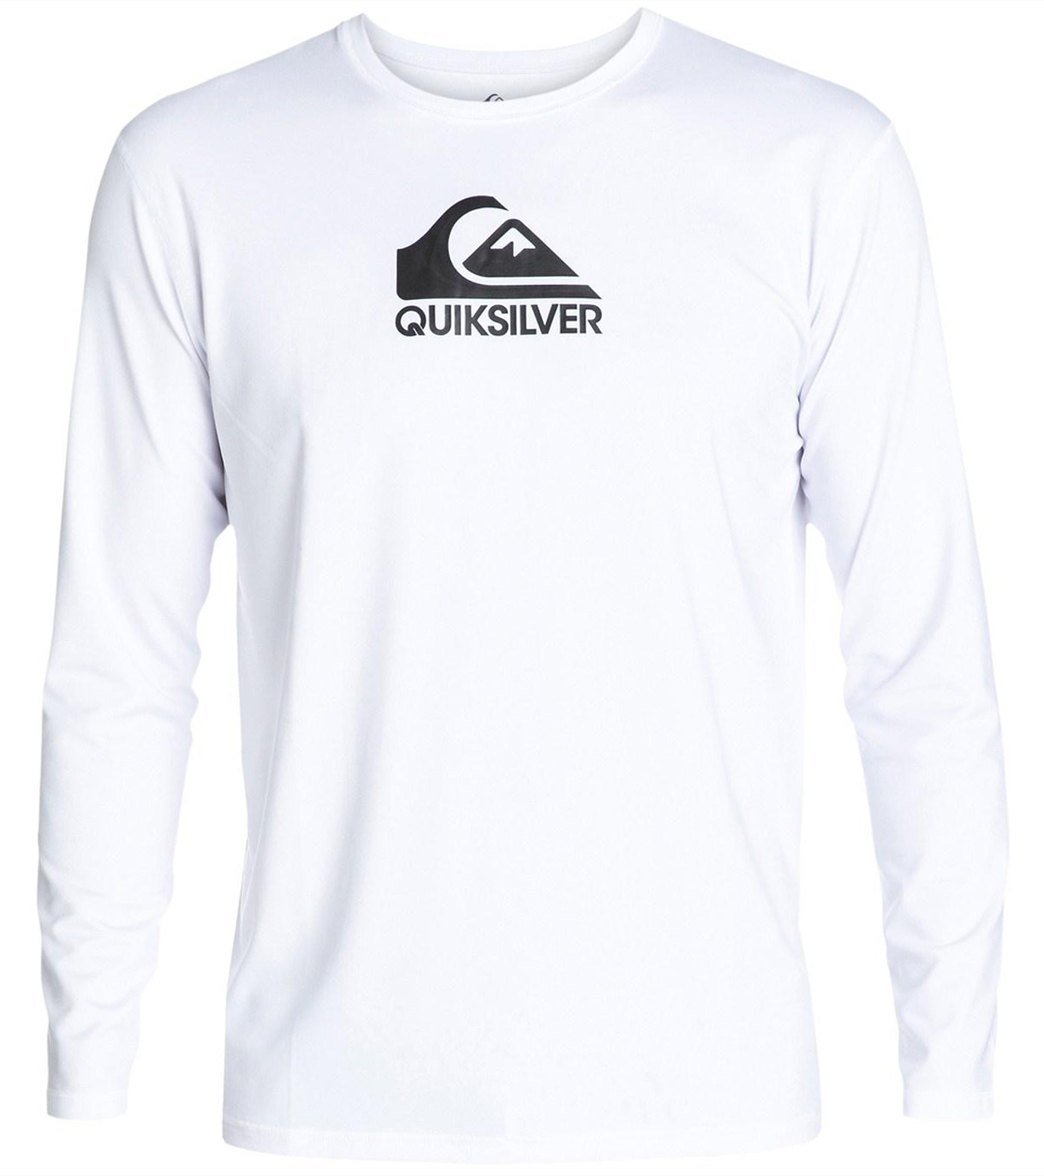 Activewear Tops Quiksilver Mens Solid Streak Long Sleeve Rashguard Ocean Blue Men's Clothing